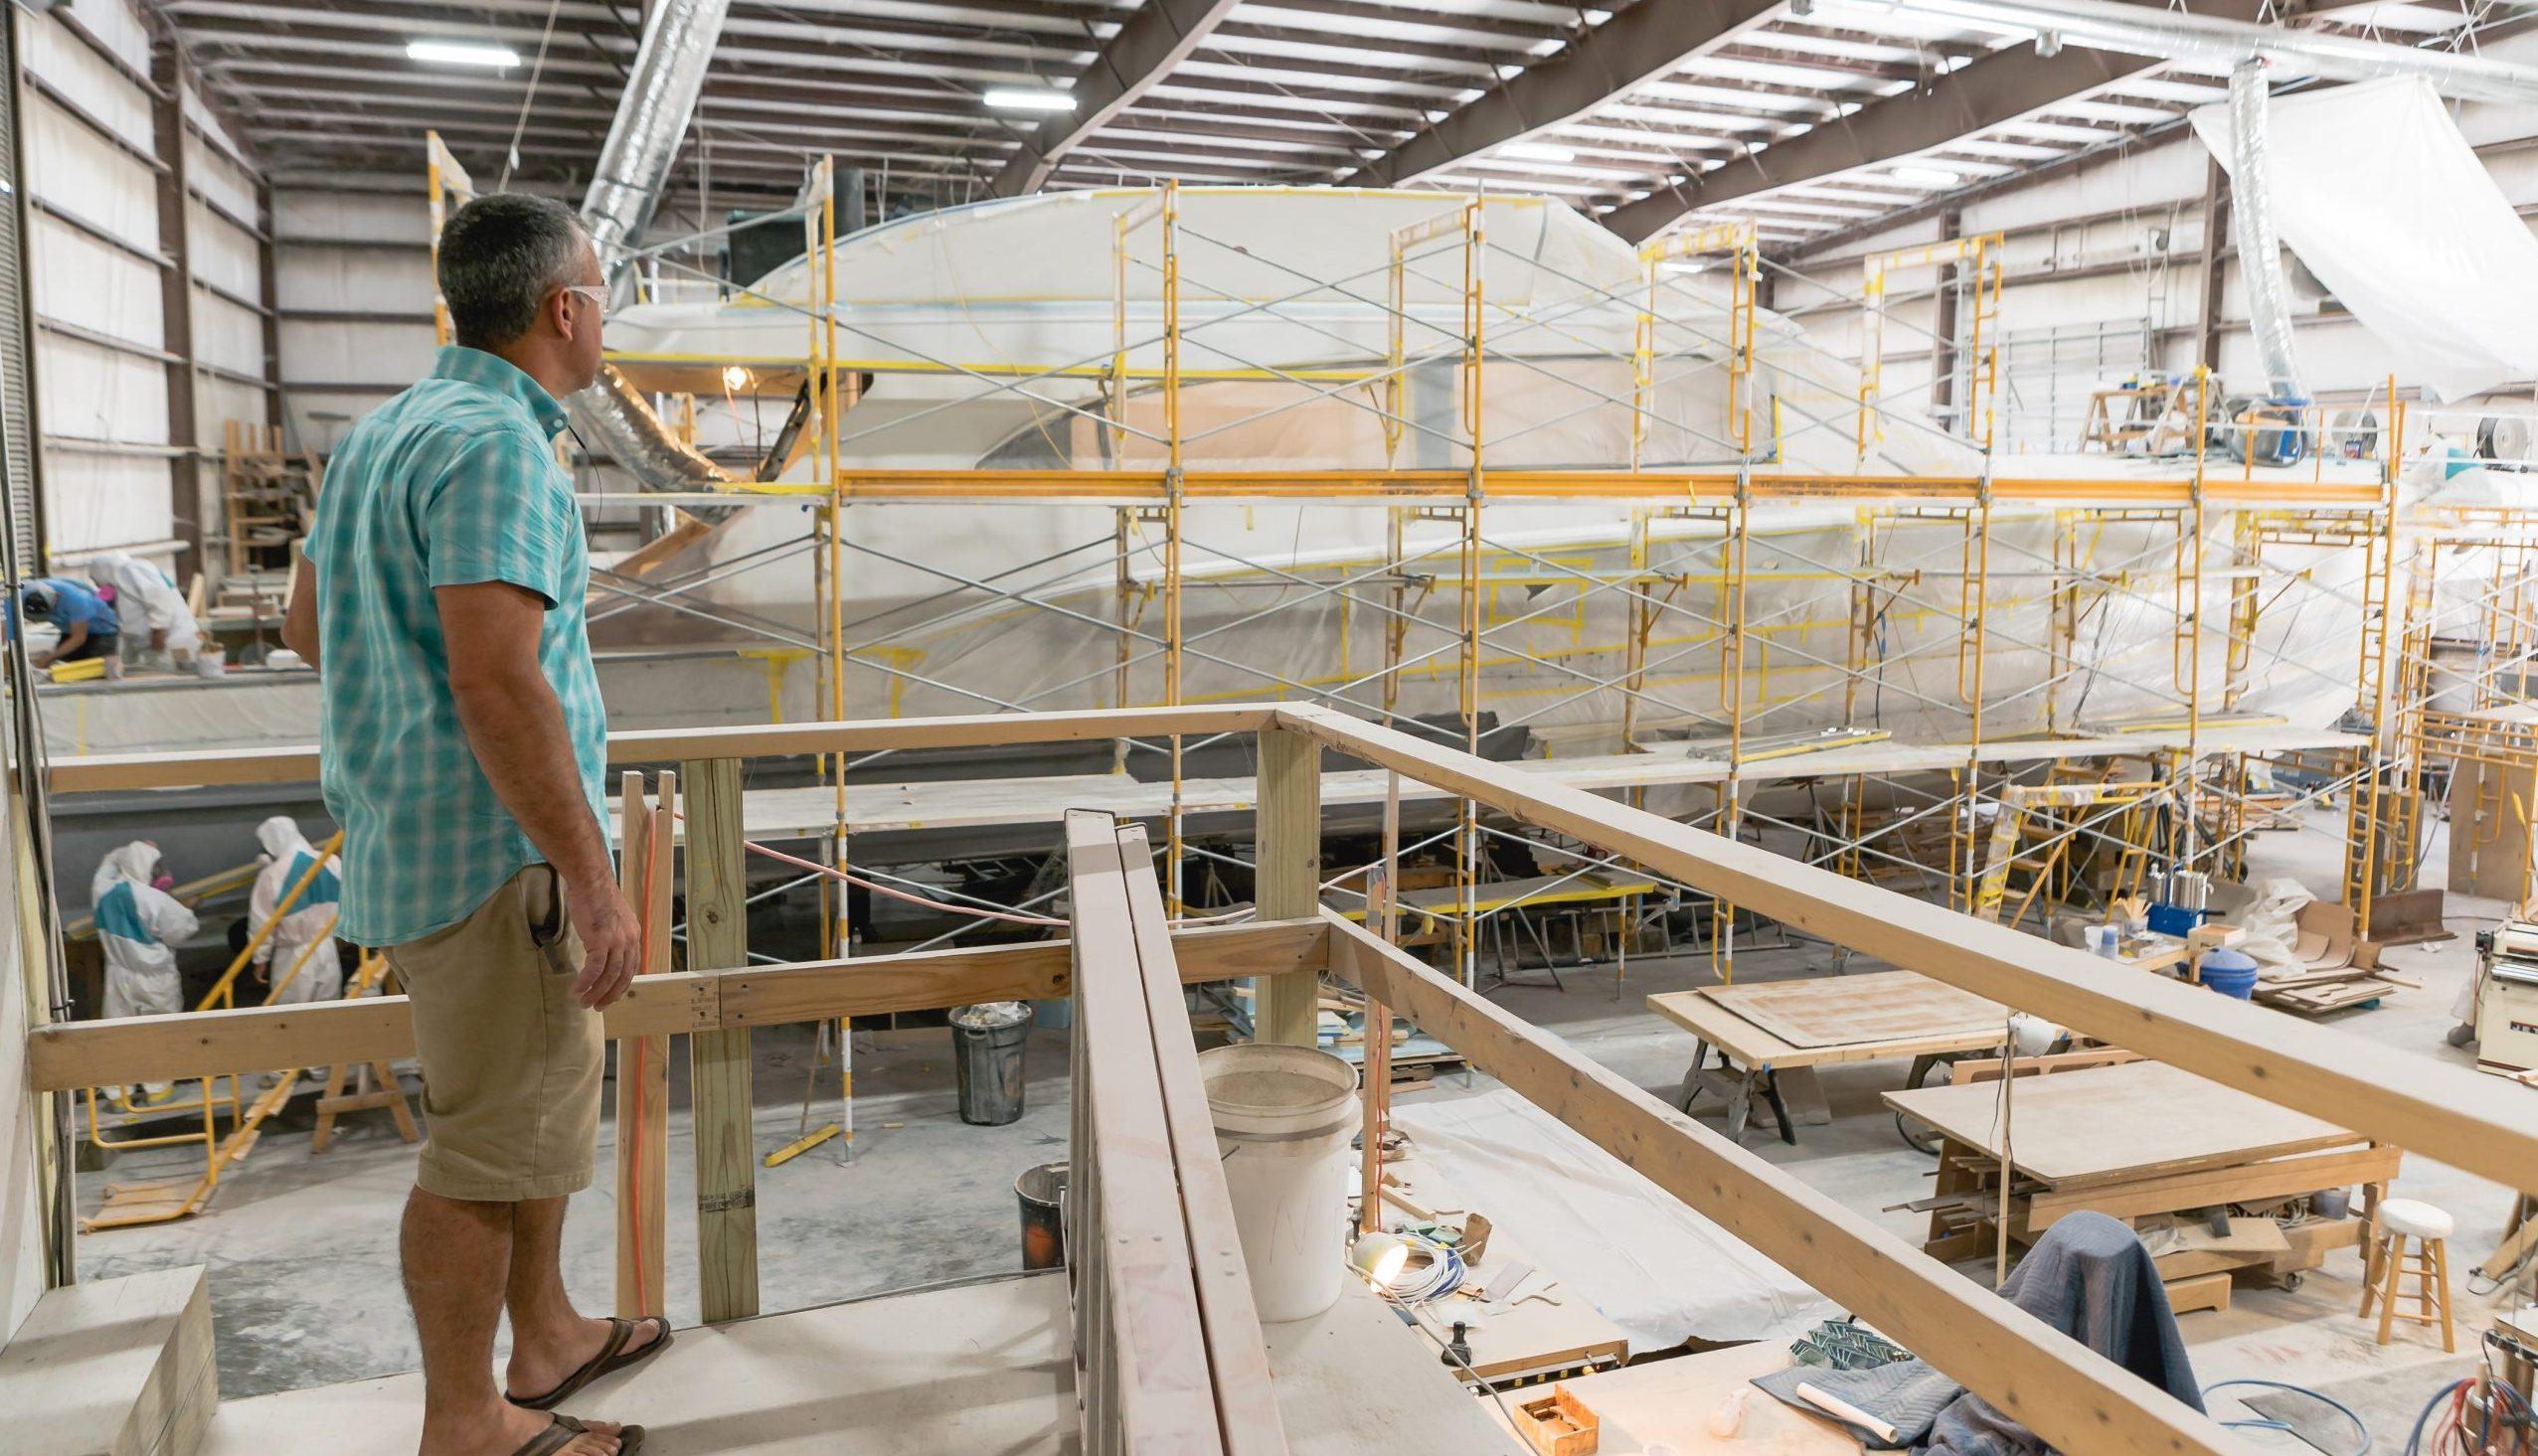 Scott overseeing a custom build